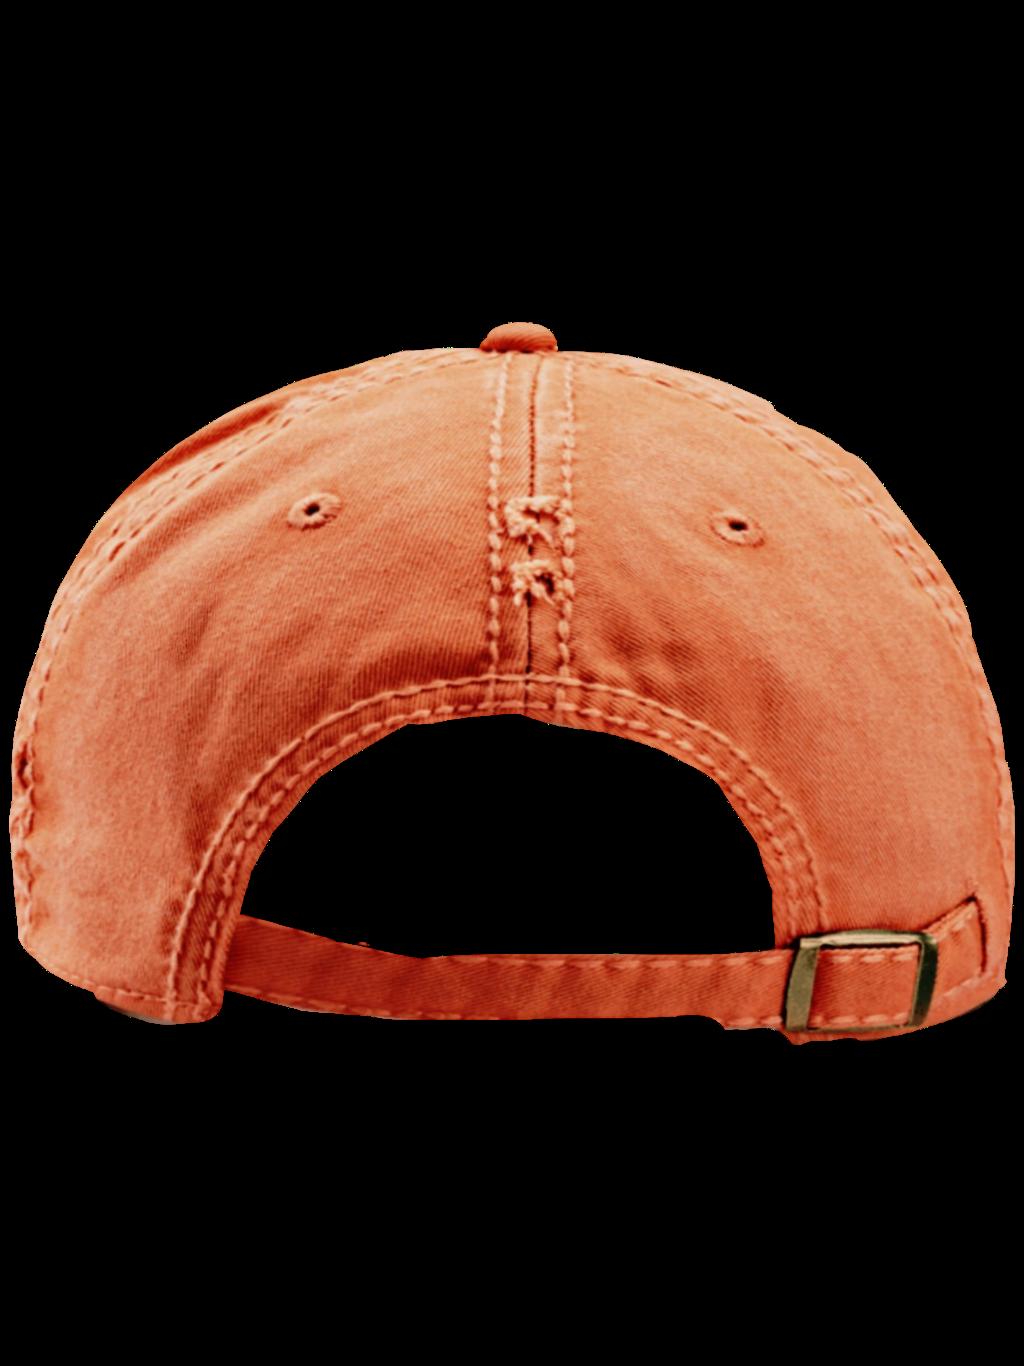 Backwards baseball cap clipart clipart royalty free fashion clothes wear baseballcap cap hat backwards oran... clipart royalty free